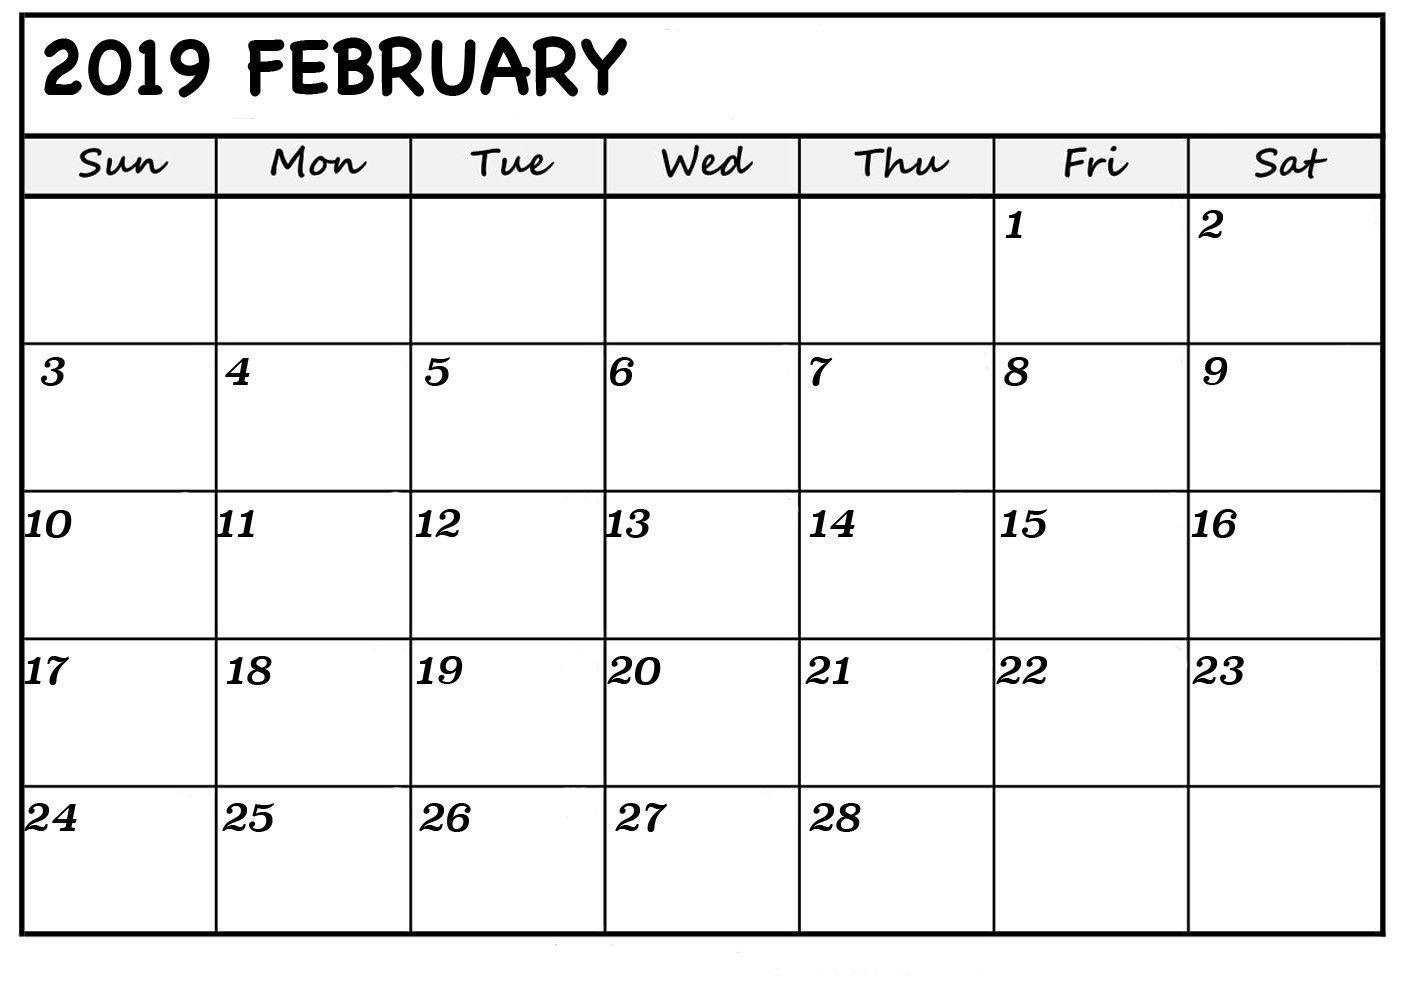 February 2019 Template Editable Calendar Download Free | December 2019 Calendar You Can Edit